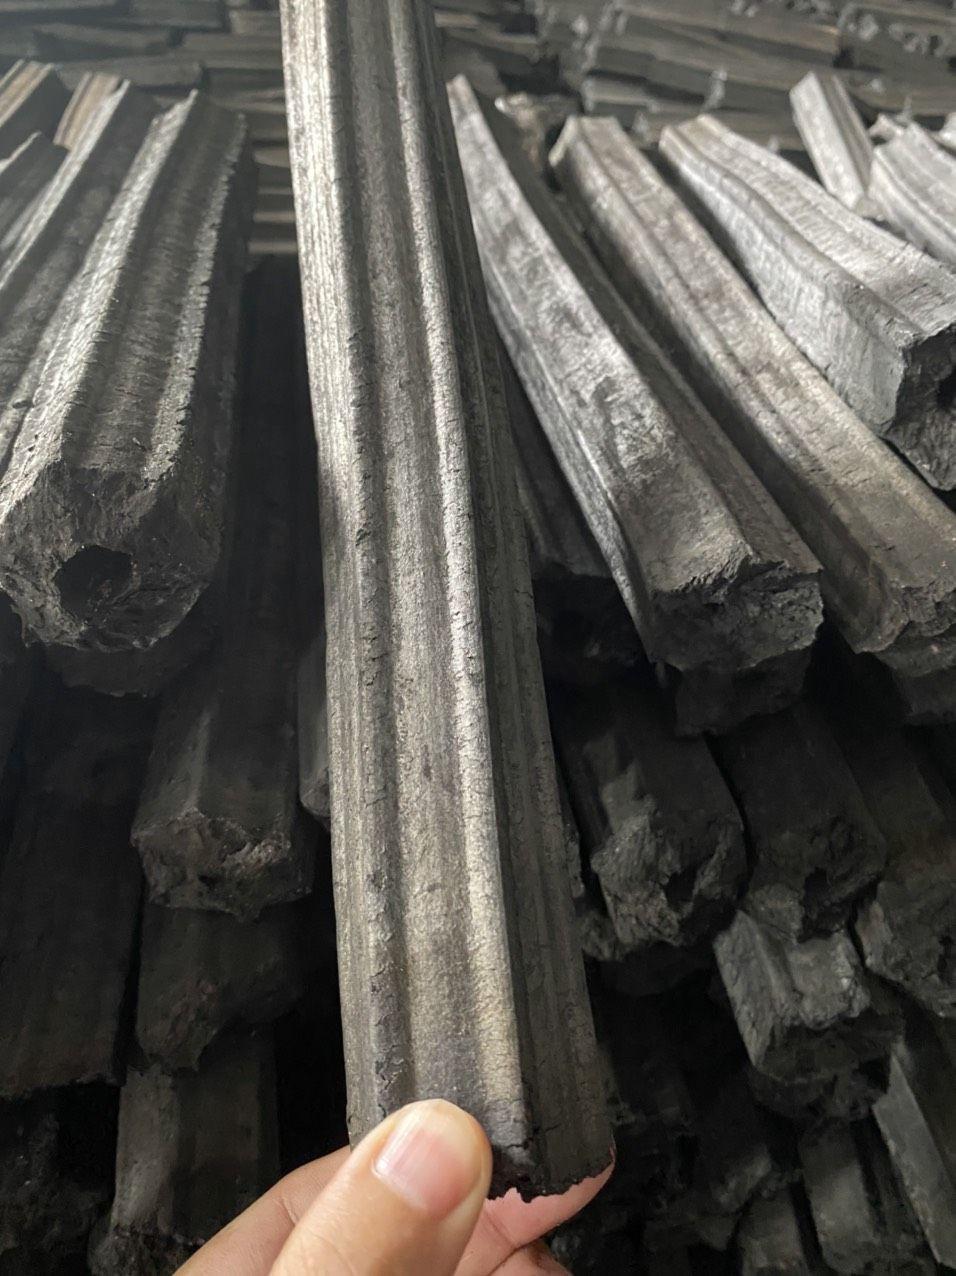 Wood Sawdust charcoal briquettes